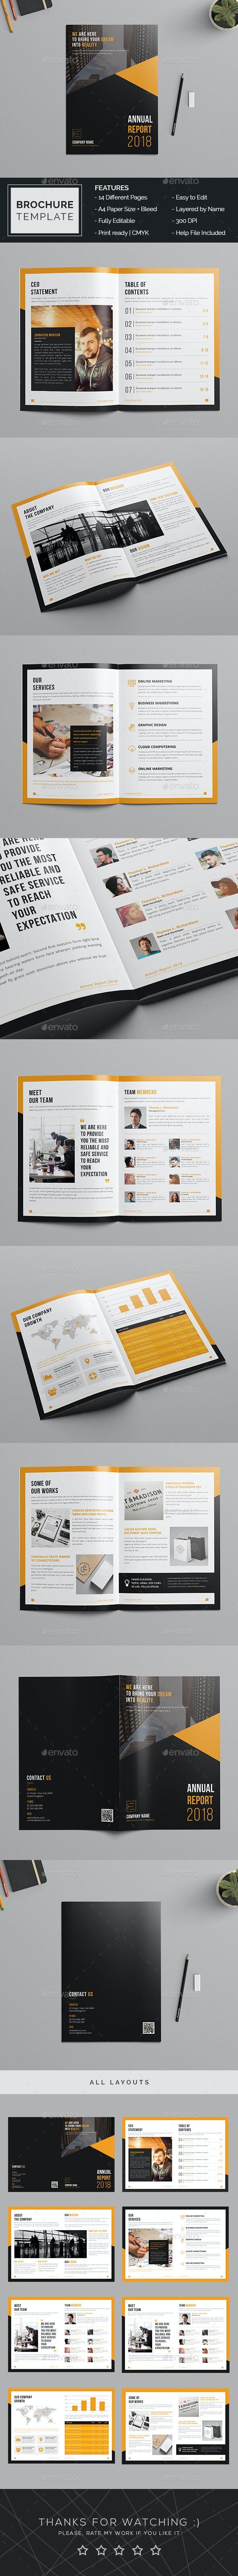 Annual Report Brochure Template - Brochures Print Templates